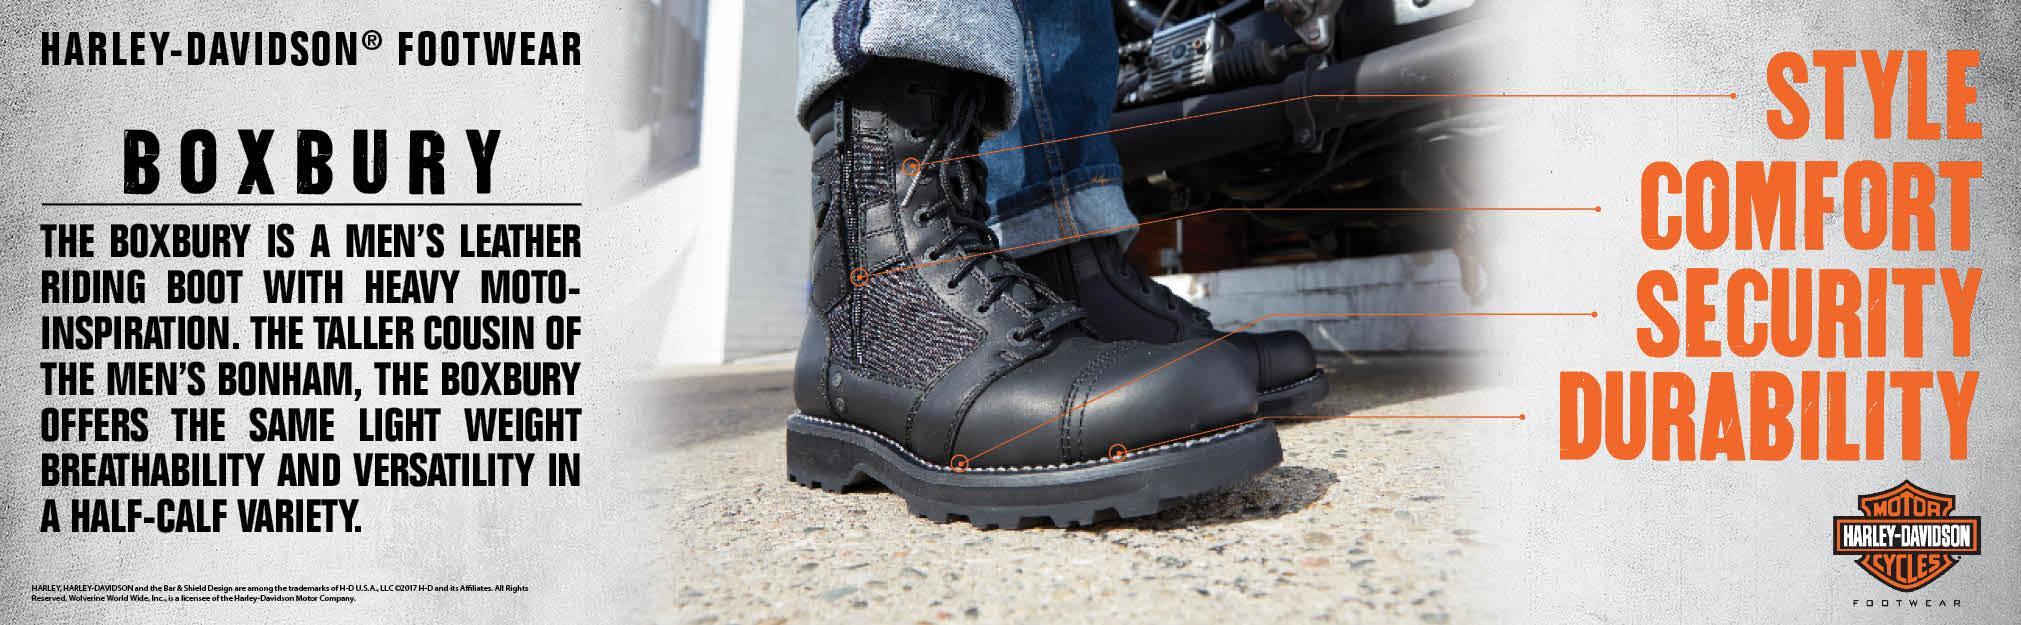 5ff0cf7dab7 Harley-Davidson Men's Boxbury Work Boot